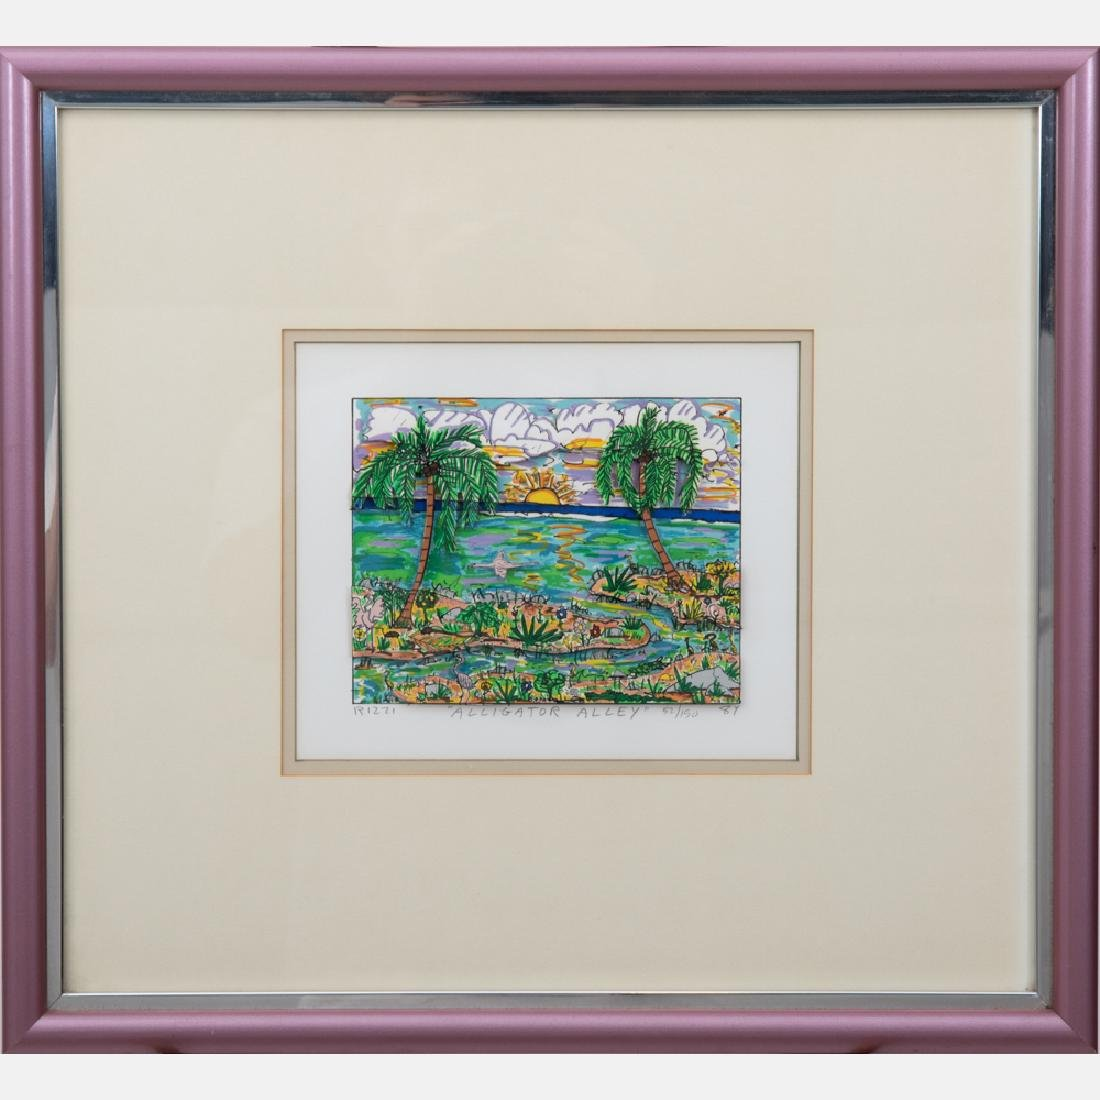 James Rizzi (1950-2011) Alligator Alley, 3D serigraph, - 2